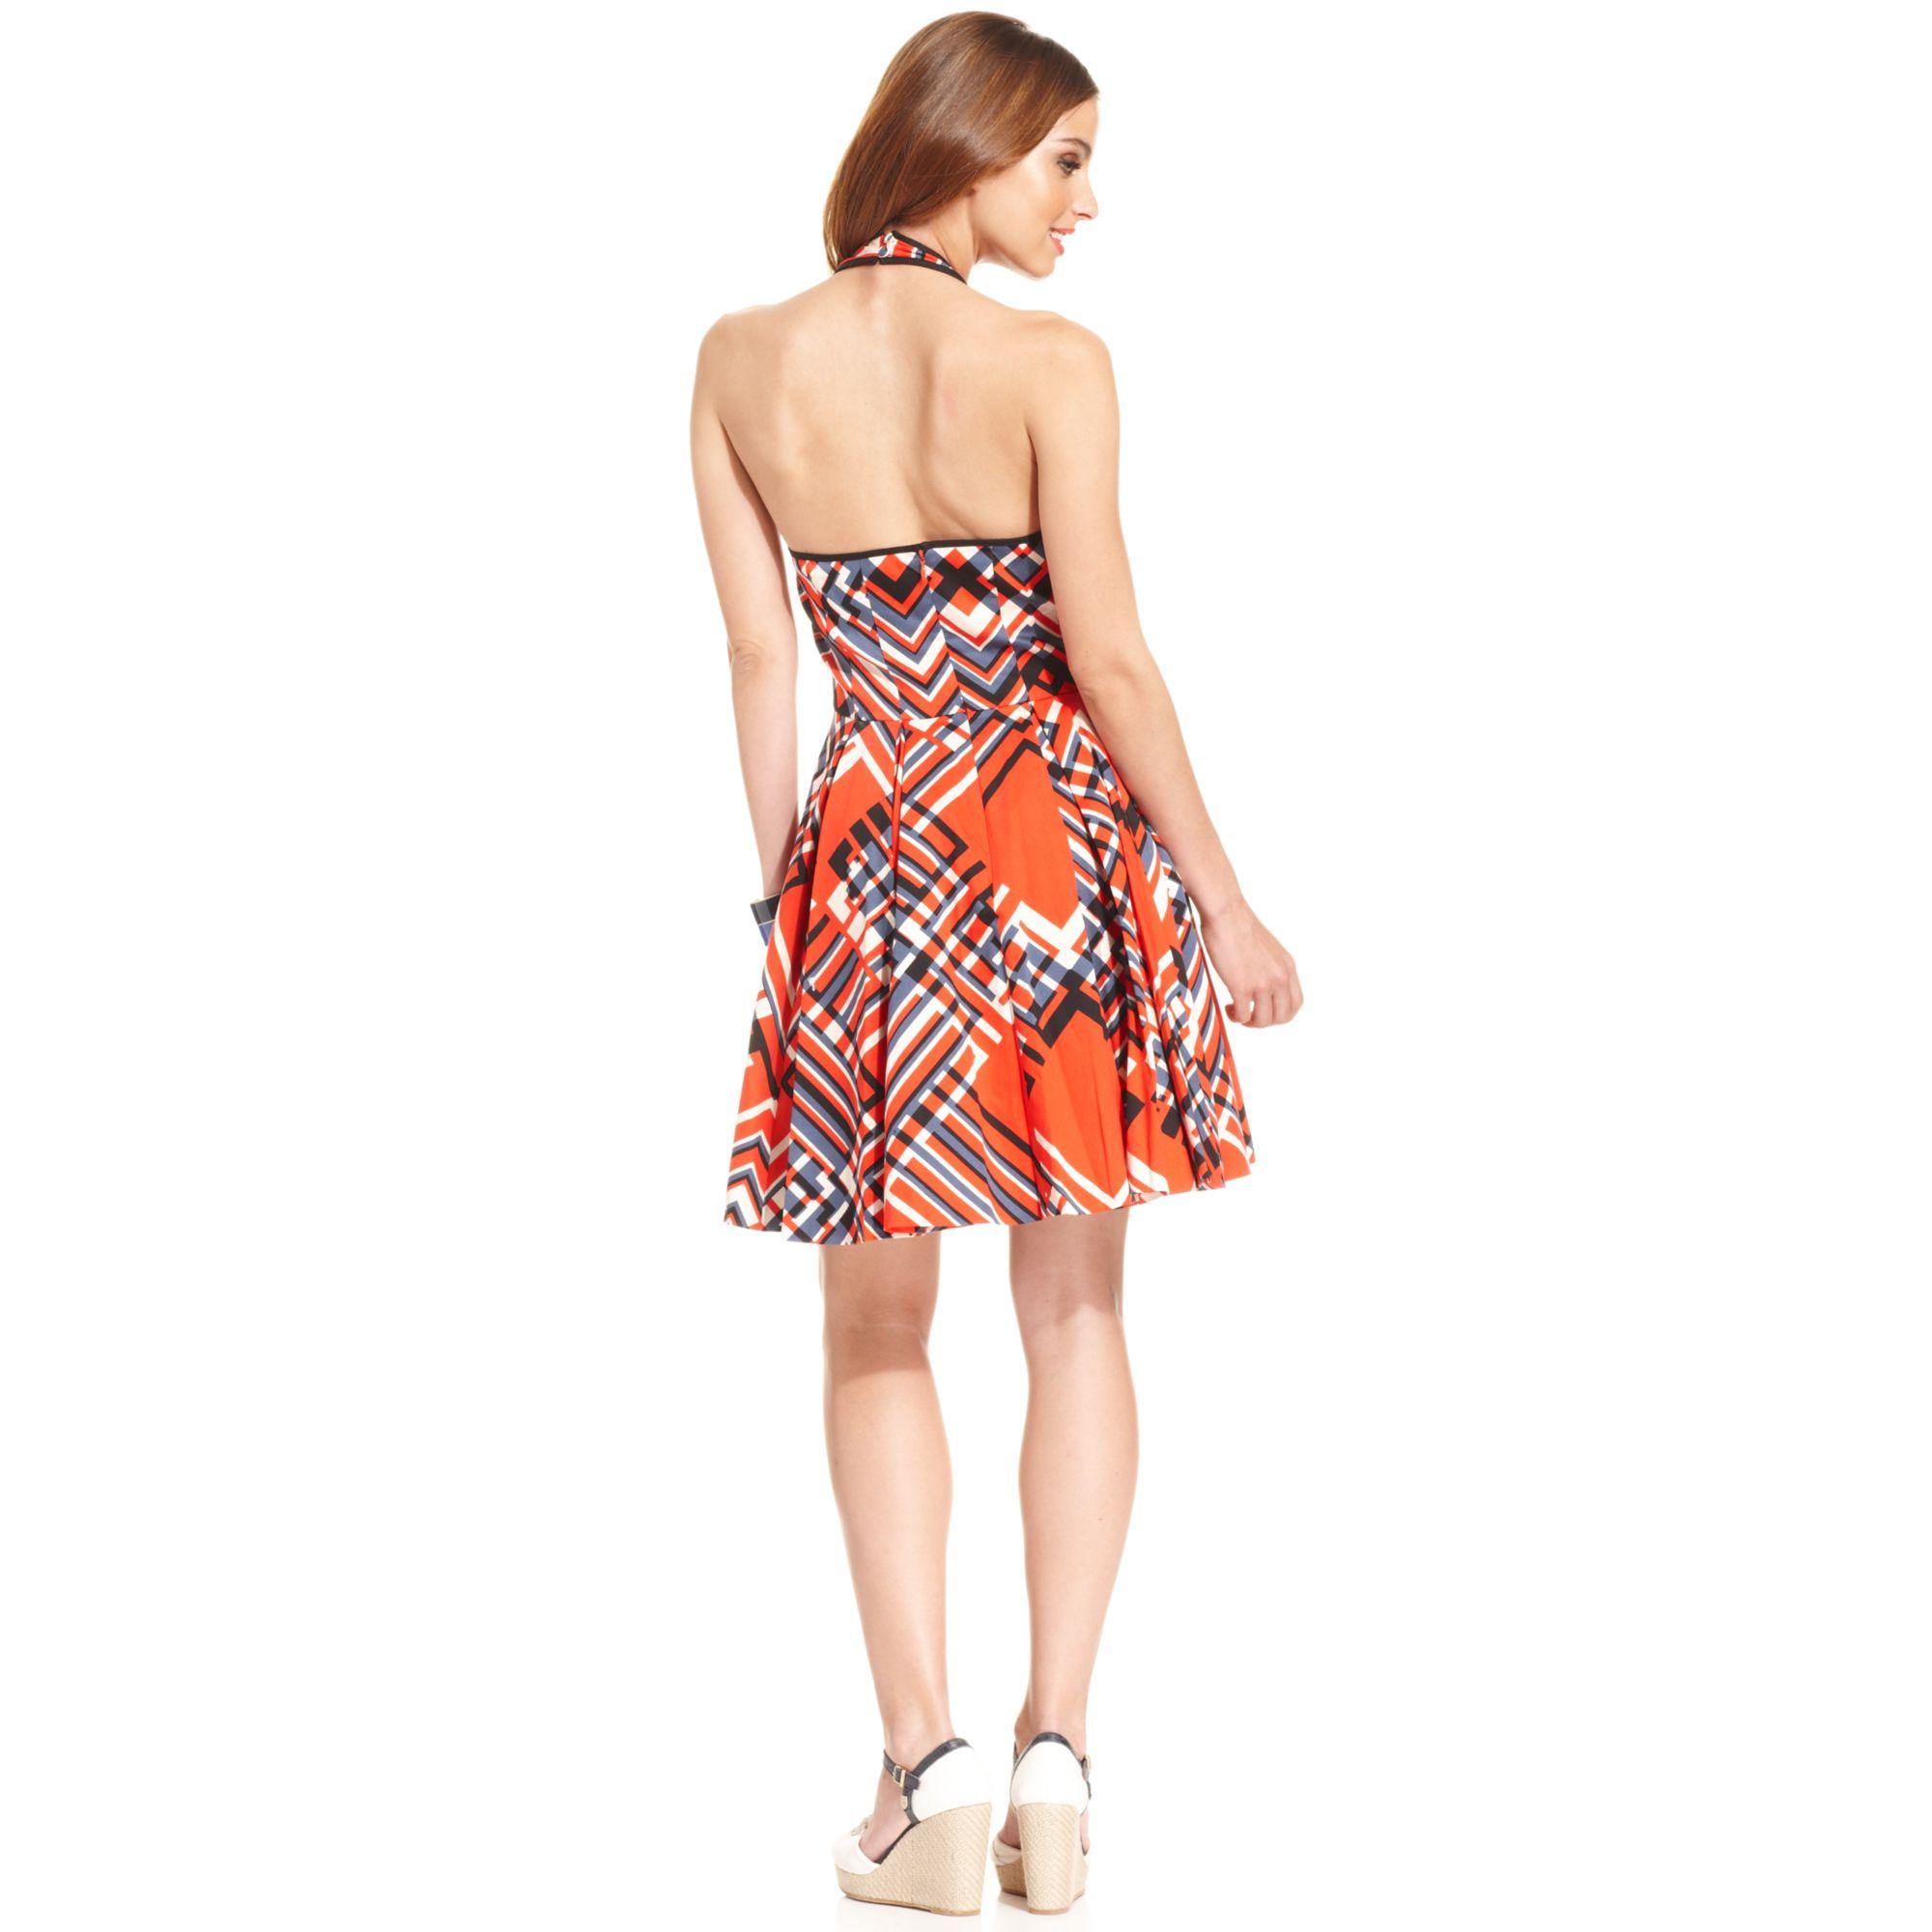 Jessica Simpson Geoprint Halter Dress Lyst